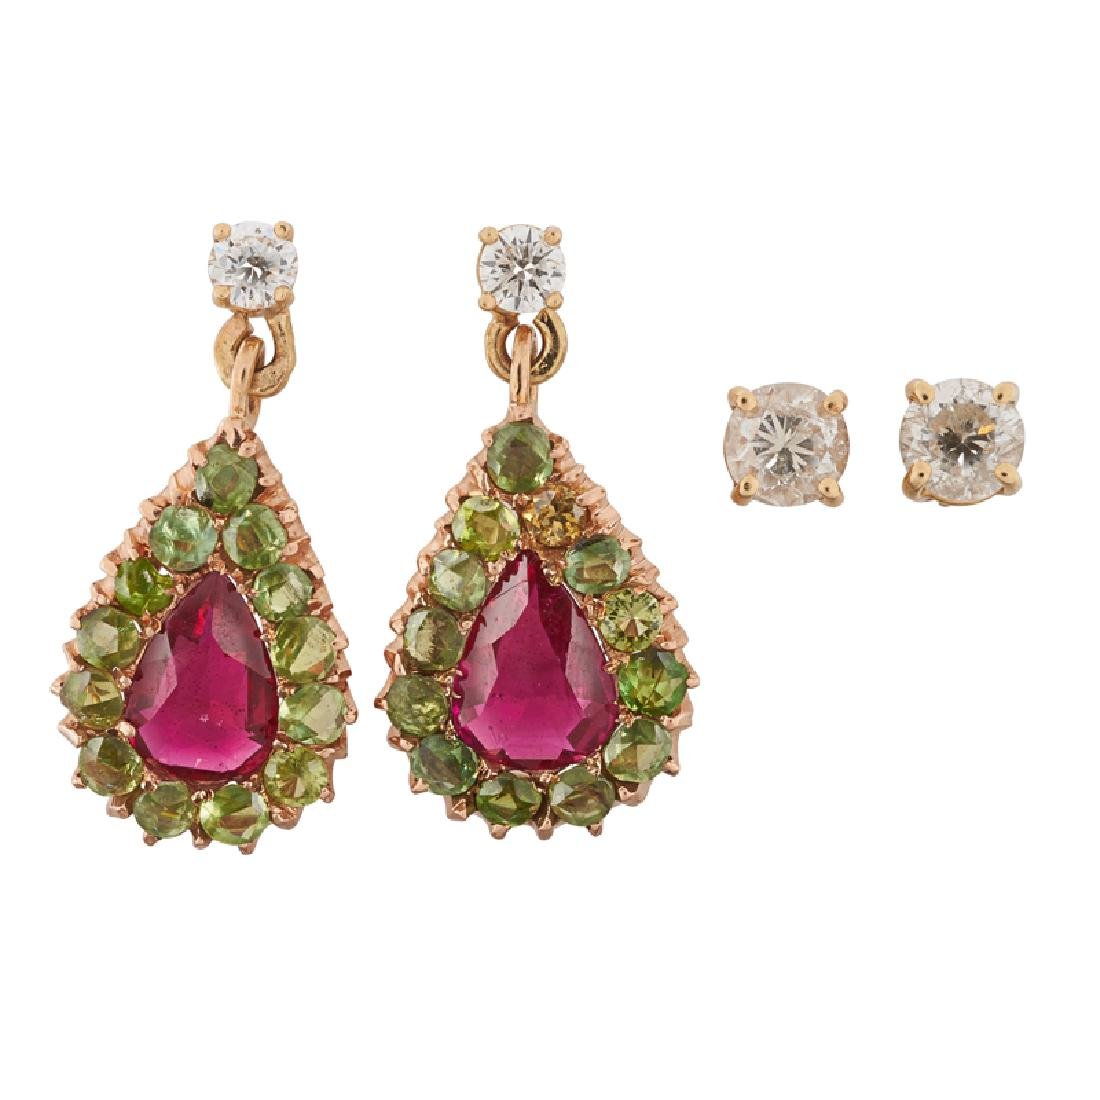 DIAMOND OR GEM-SET YELLOW GOLD EARRINGS